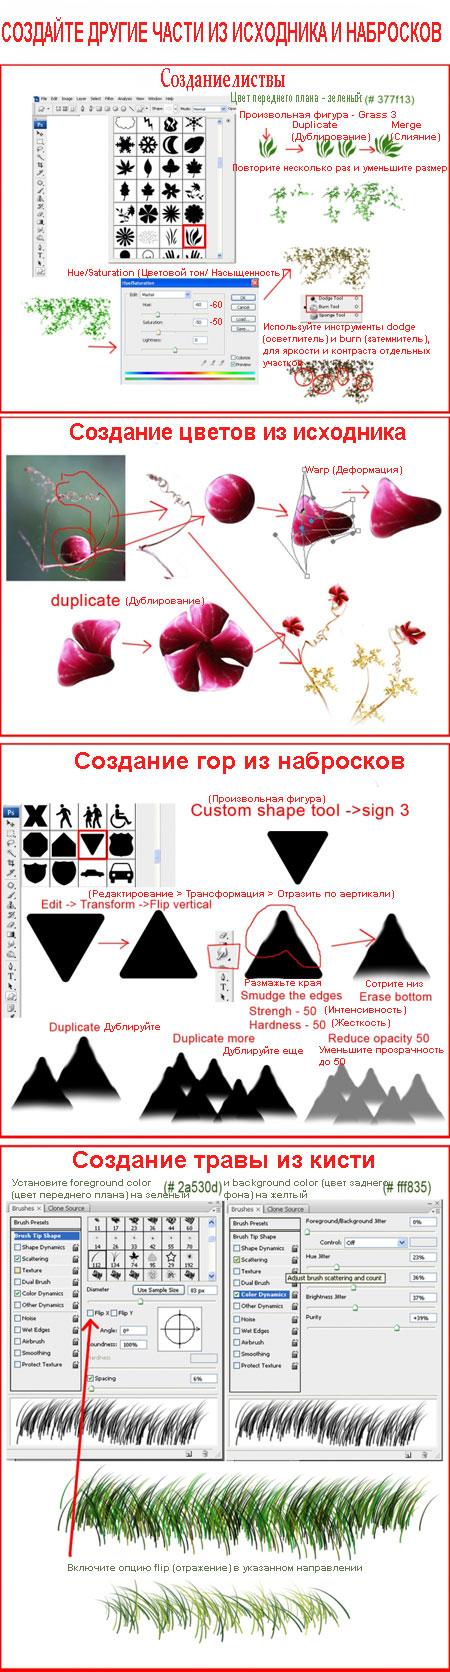 http://www.photoshop-master.ru/lessons/les1183/15.jpg